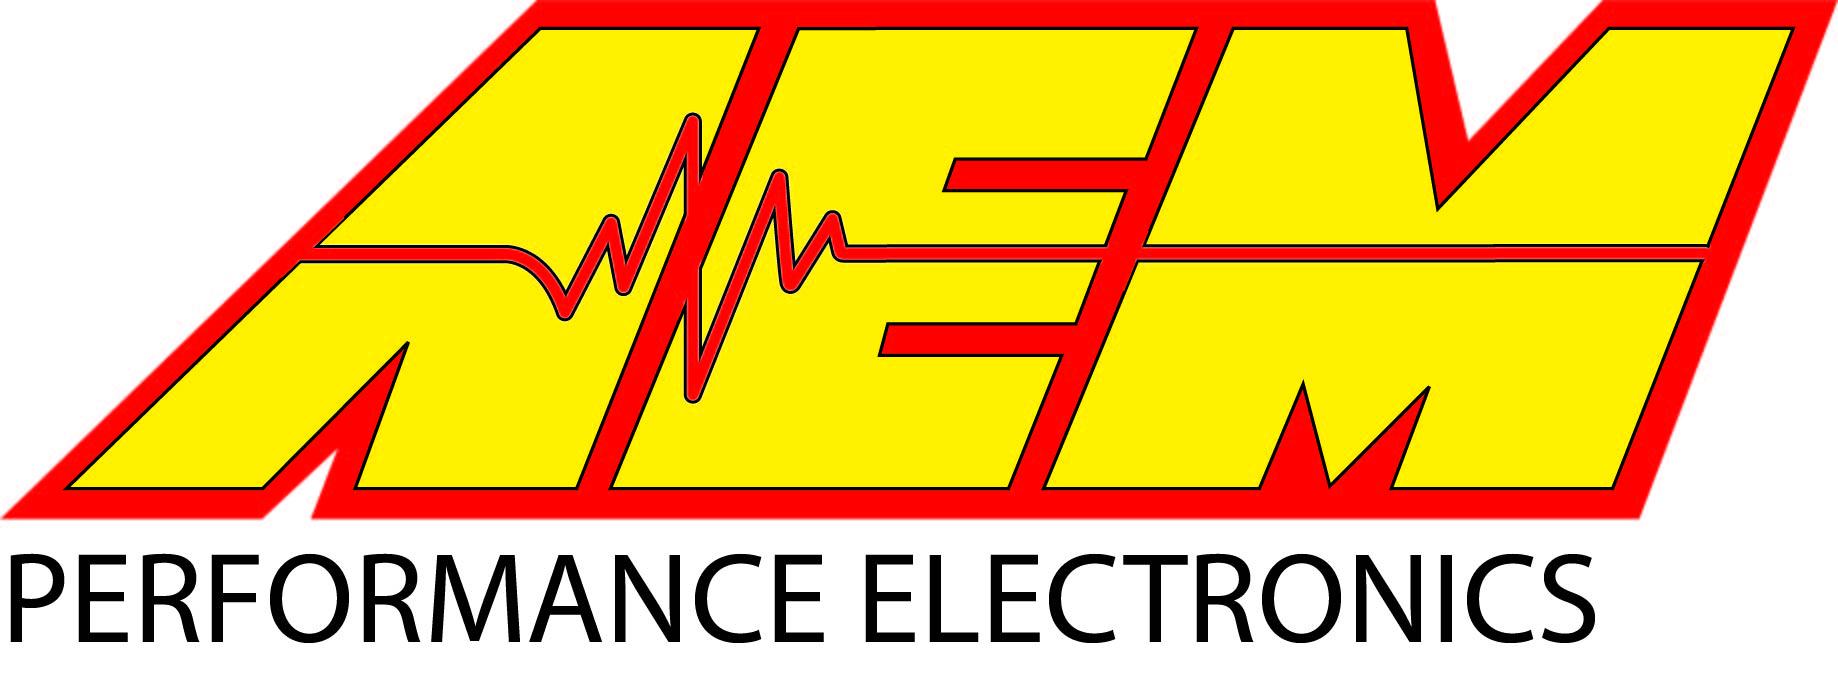 Aem Logo PNG - 114024